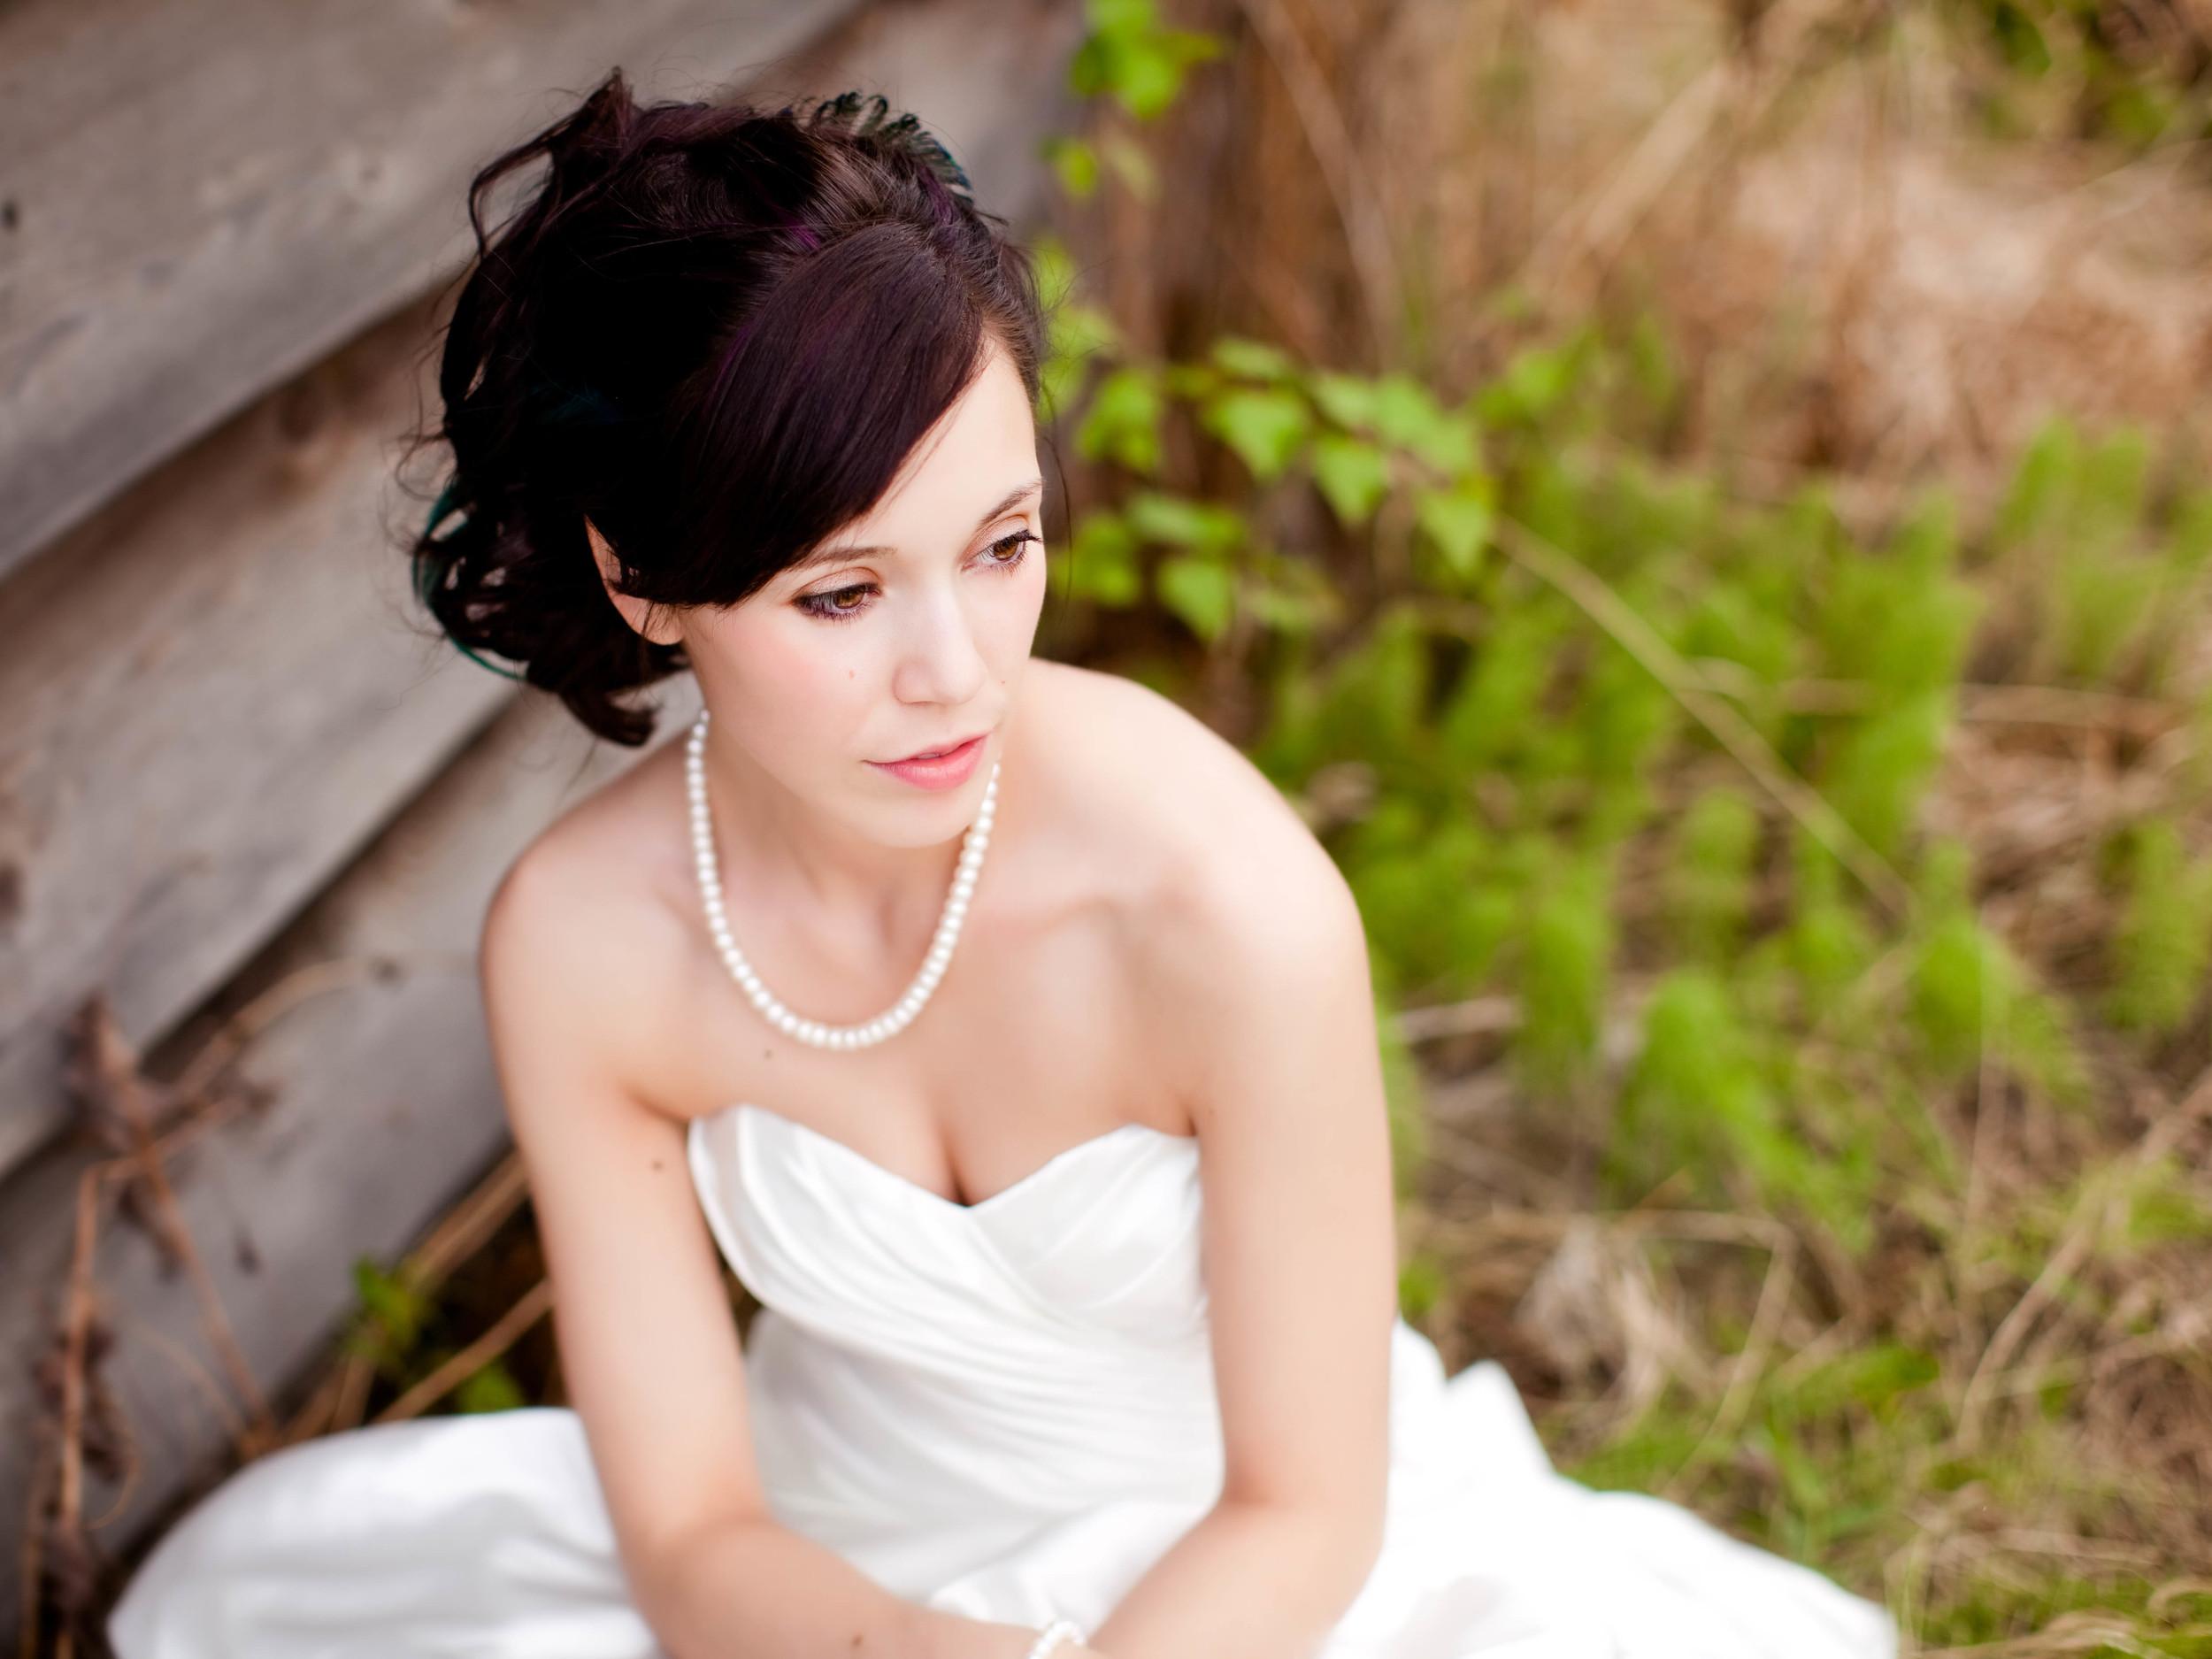 tg-wedding-photography-6.jpg